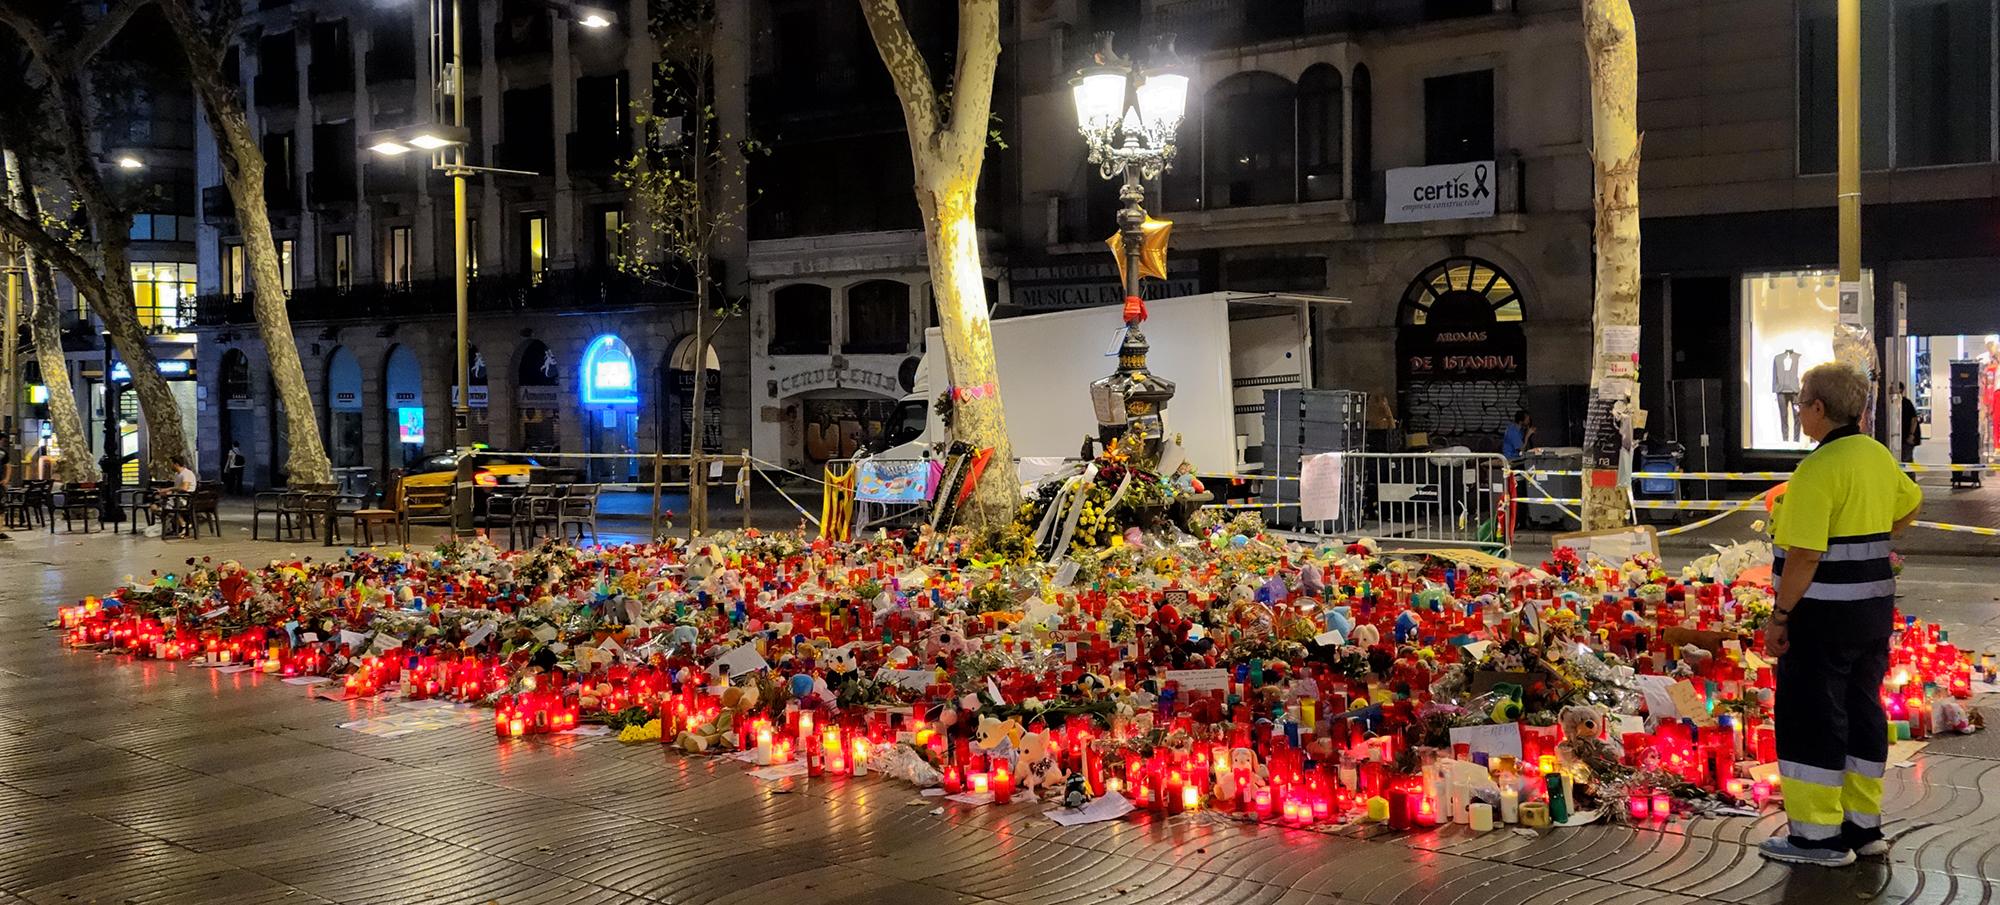 Las Ramblas, #1. Barcelona, 2017